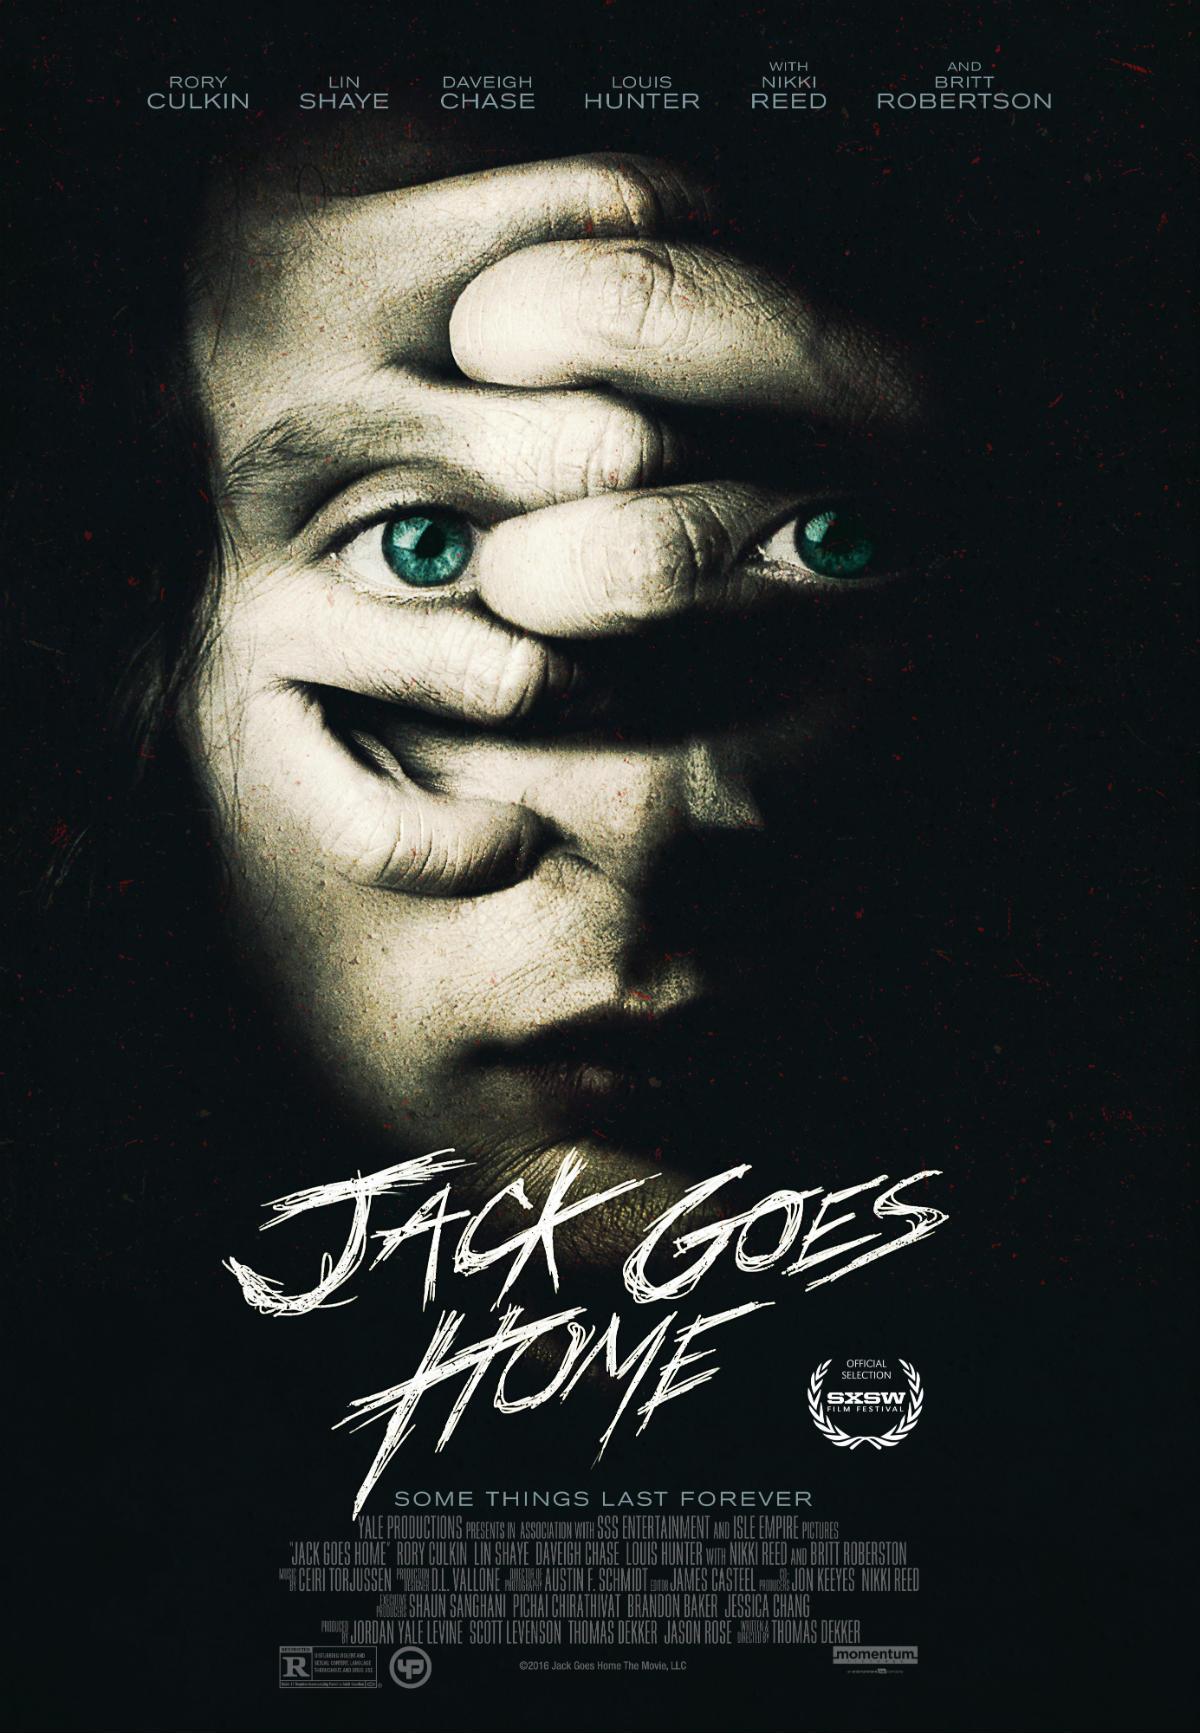 Jack-Goes-Home-poster.jpg